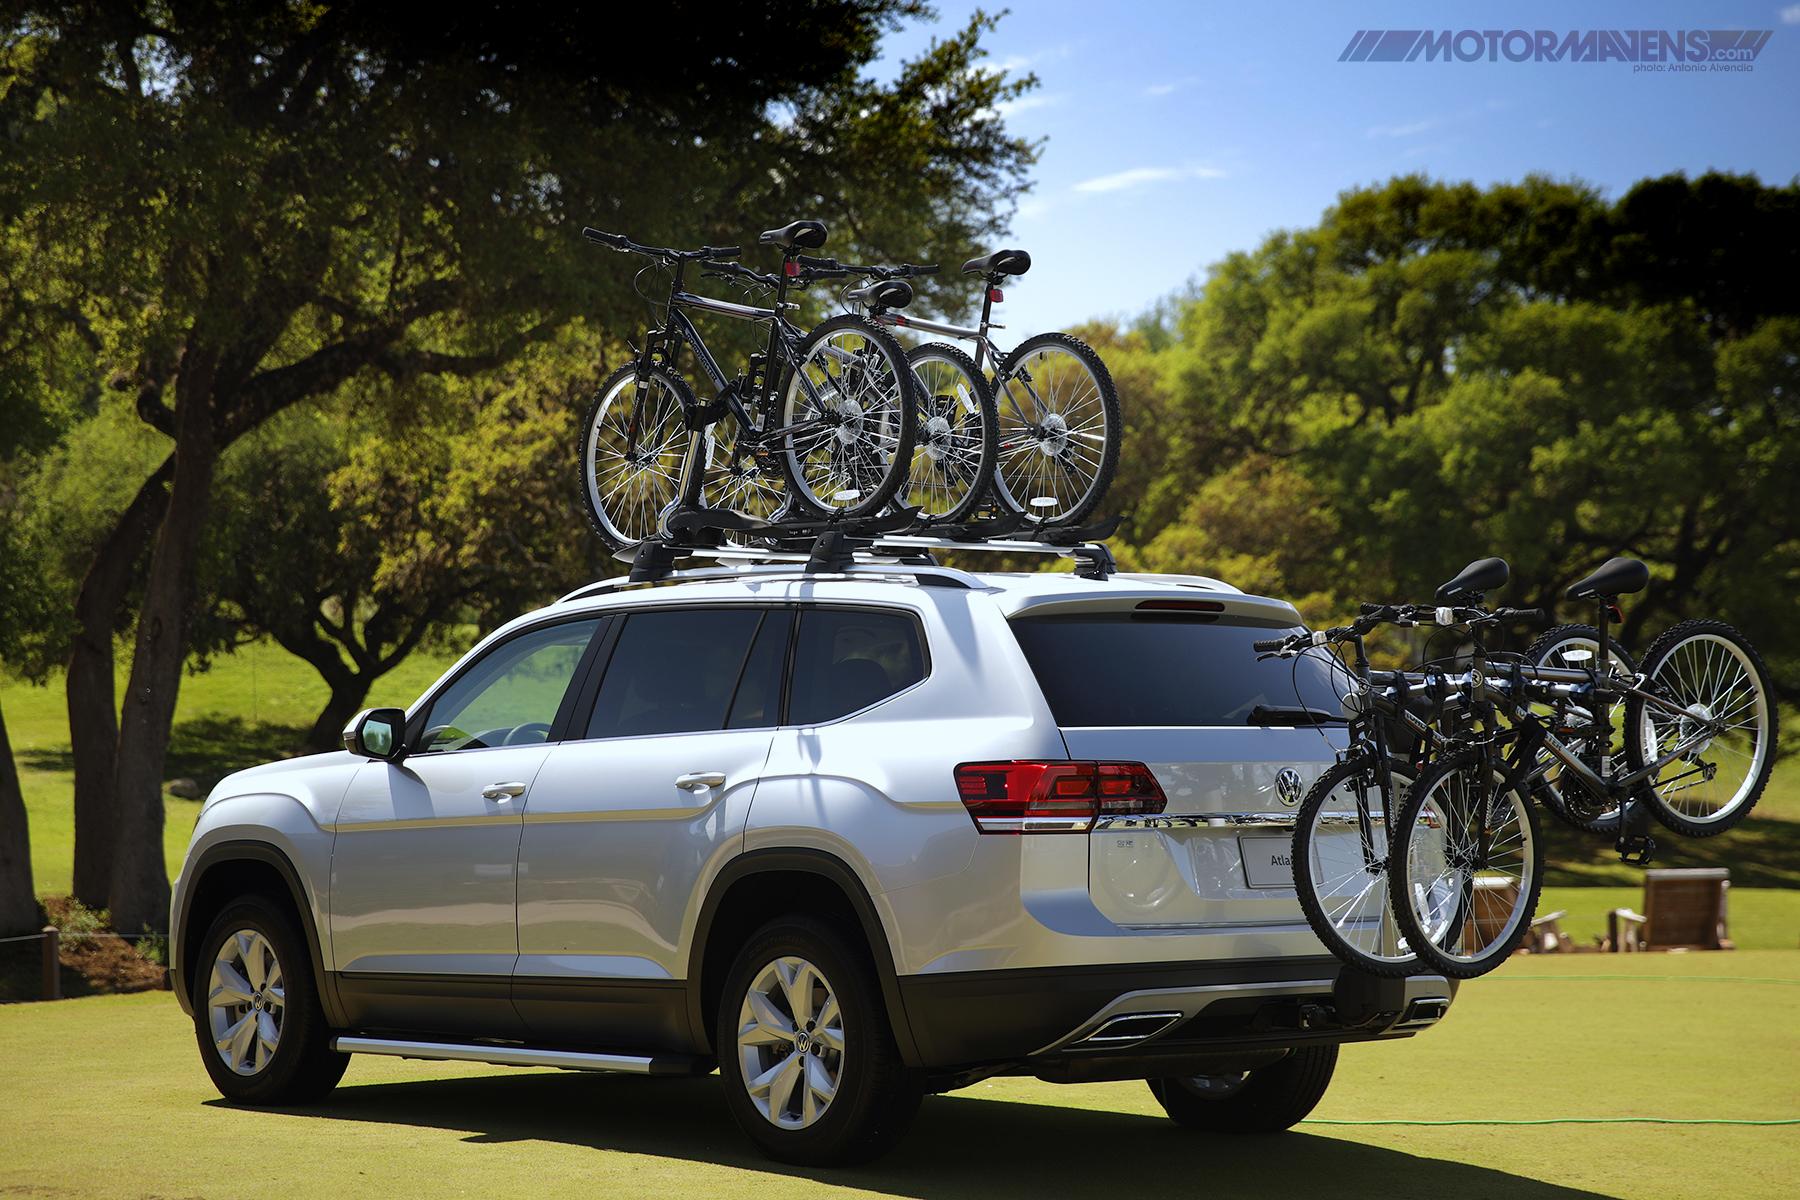 Rear Bike Rack Roof rack on VW Atlas 7 seat 3 row SUV 4Motion AWD Turbocharged